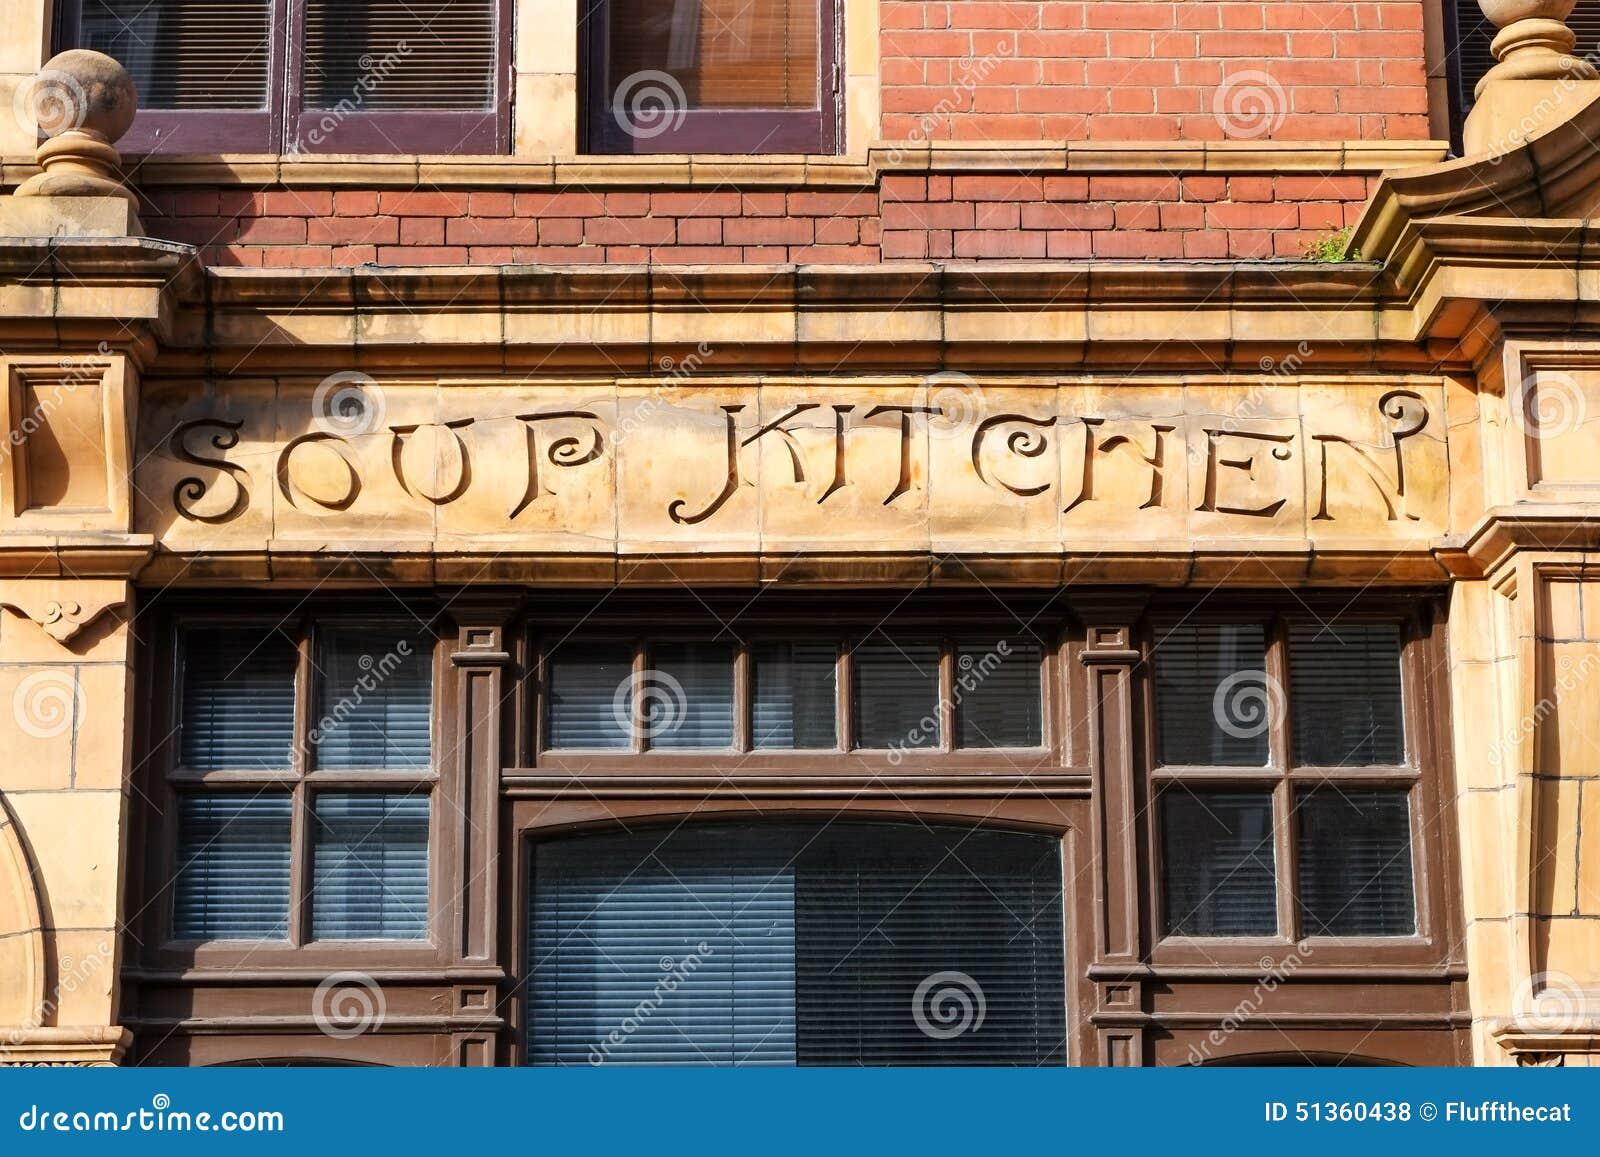 Soup Kitchen East London